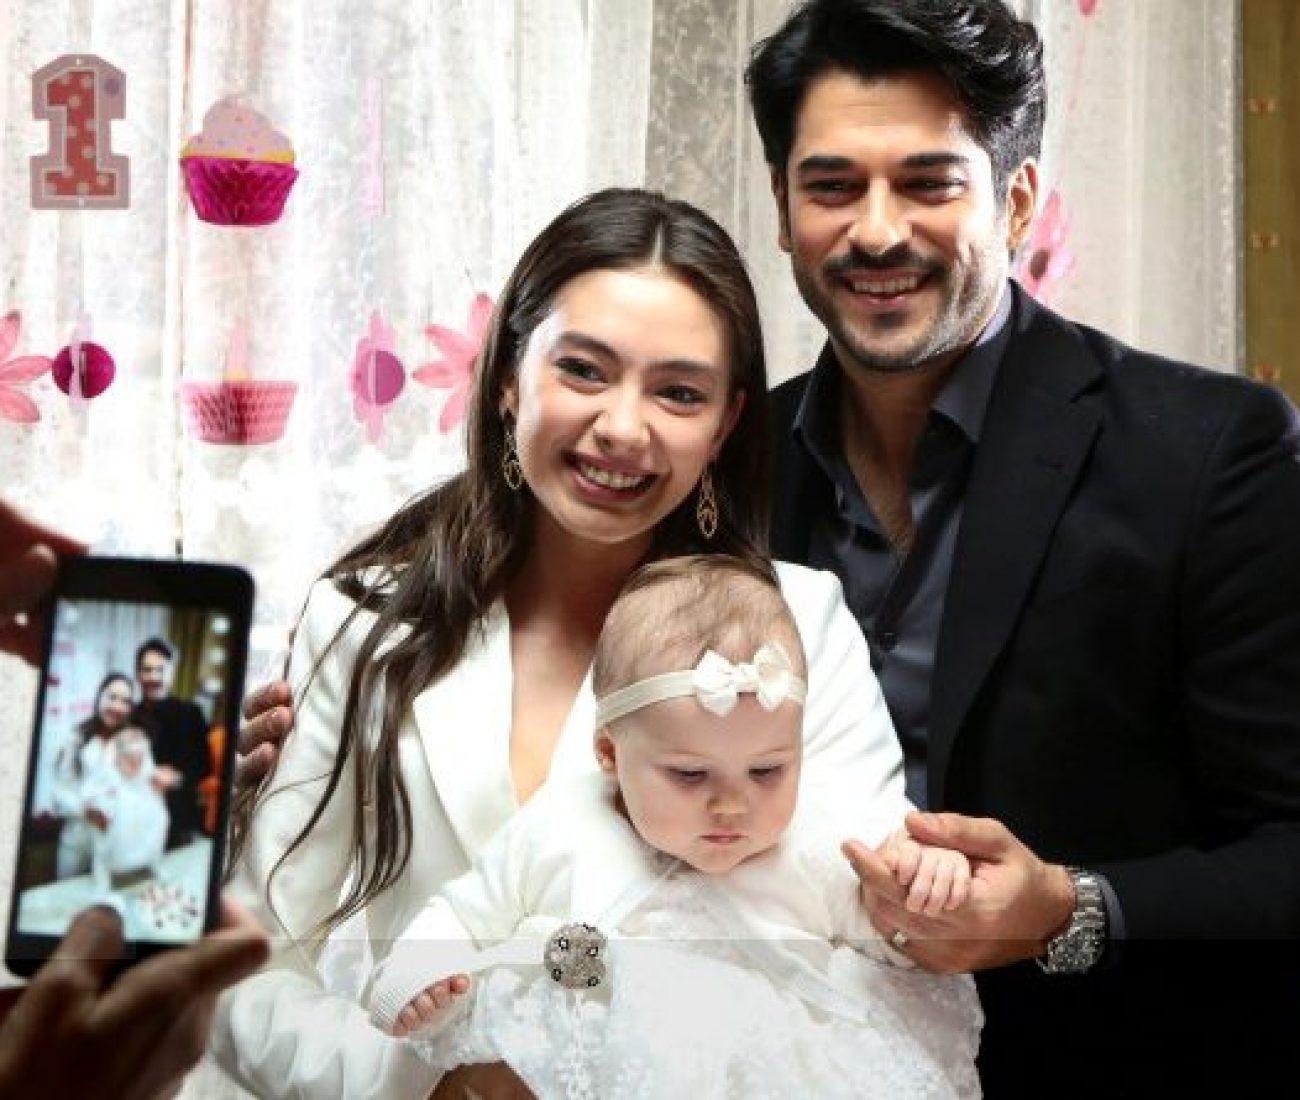 دانلود سریال Kara Sevda (عشق بی پایان) محصول شبکه GEM TV (قسمت 45)